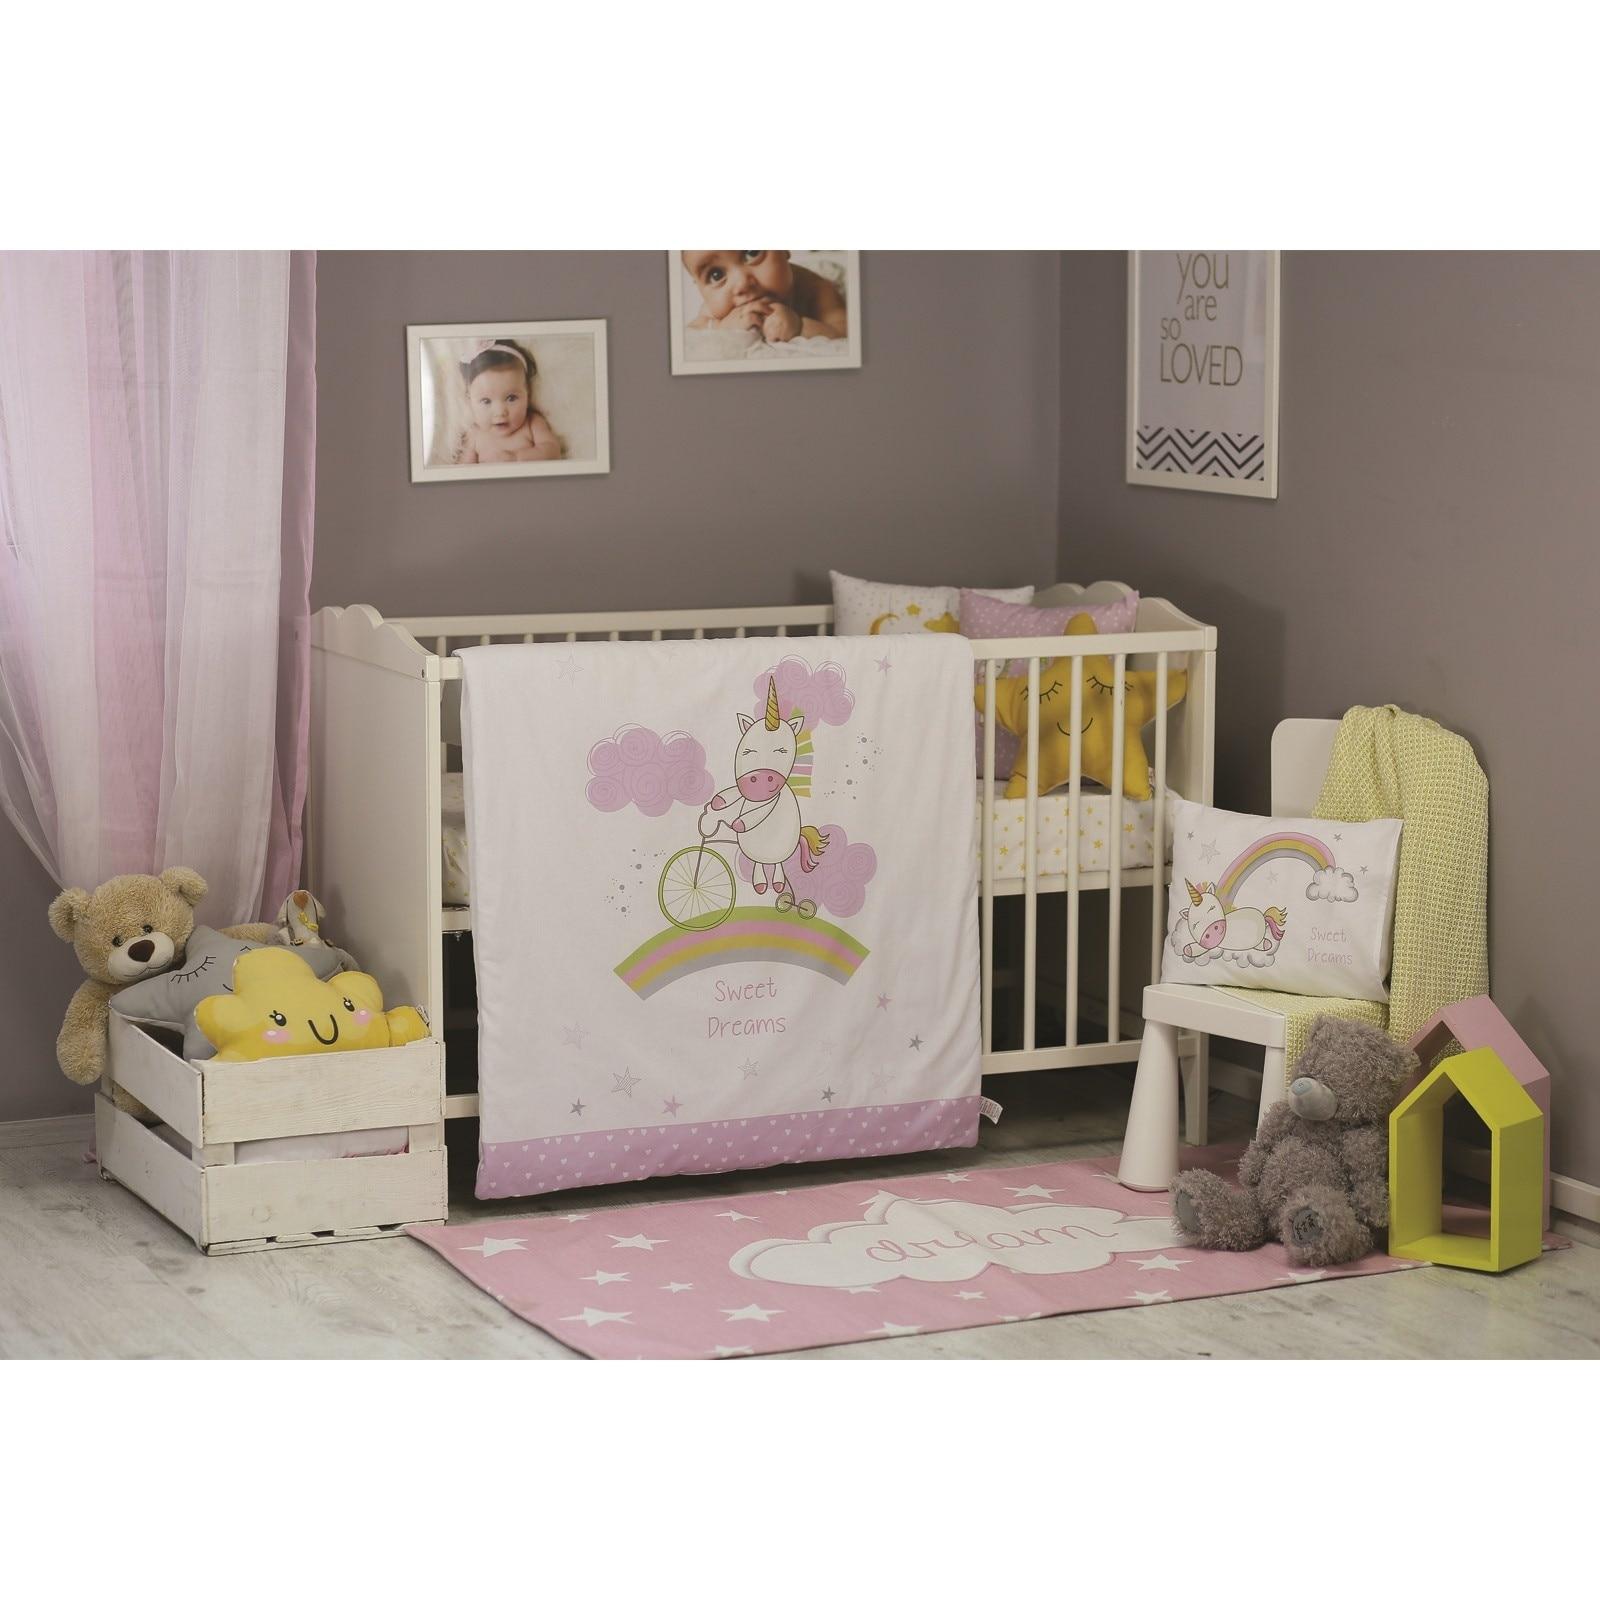 Ebebek Apolena Baby Unicorn Bed Filled Duvet Cover 80x100 Cm